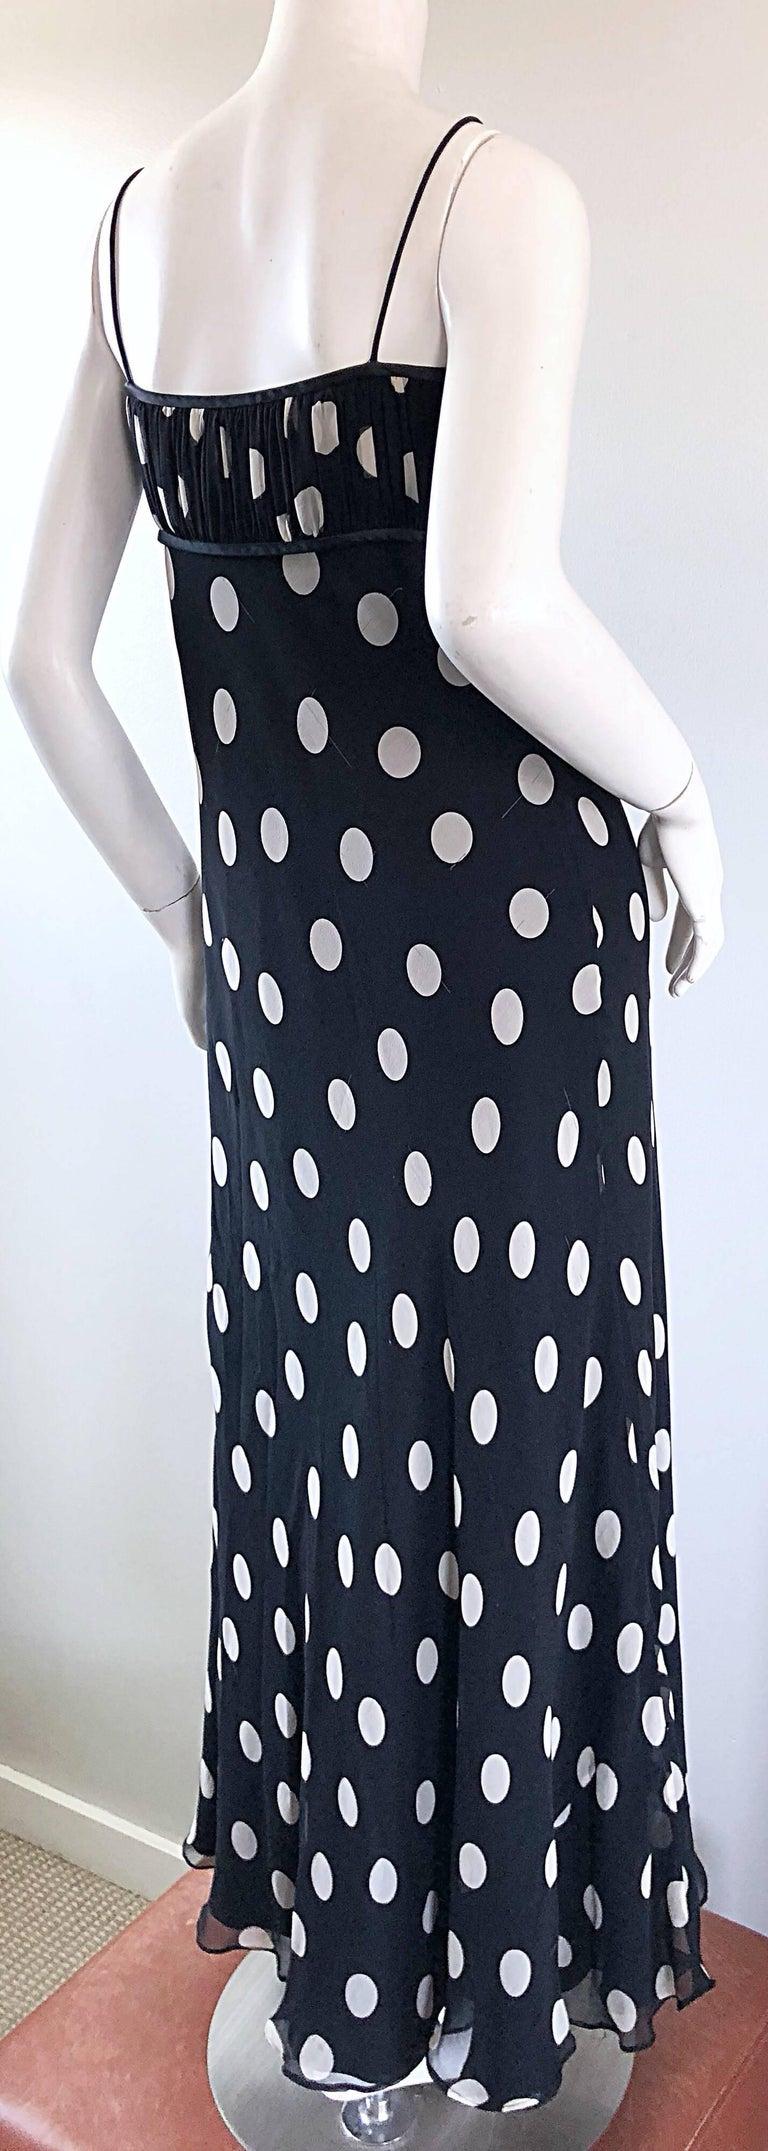 1990s Abriele Melano Black and White Polka Dot Silk Chiffon Maxi Dress 90s Gown For Sale 4